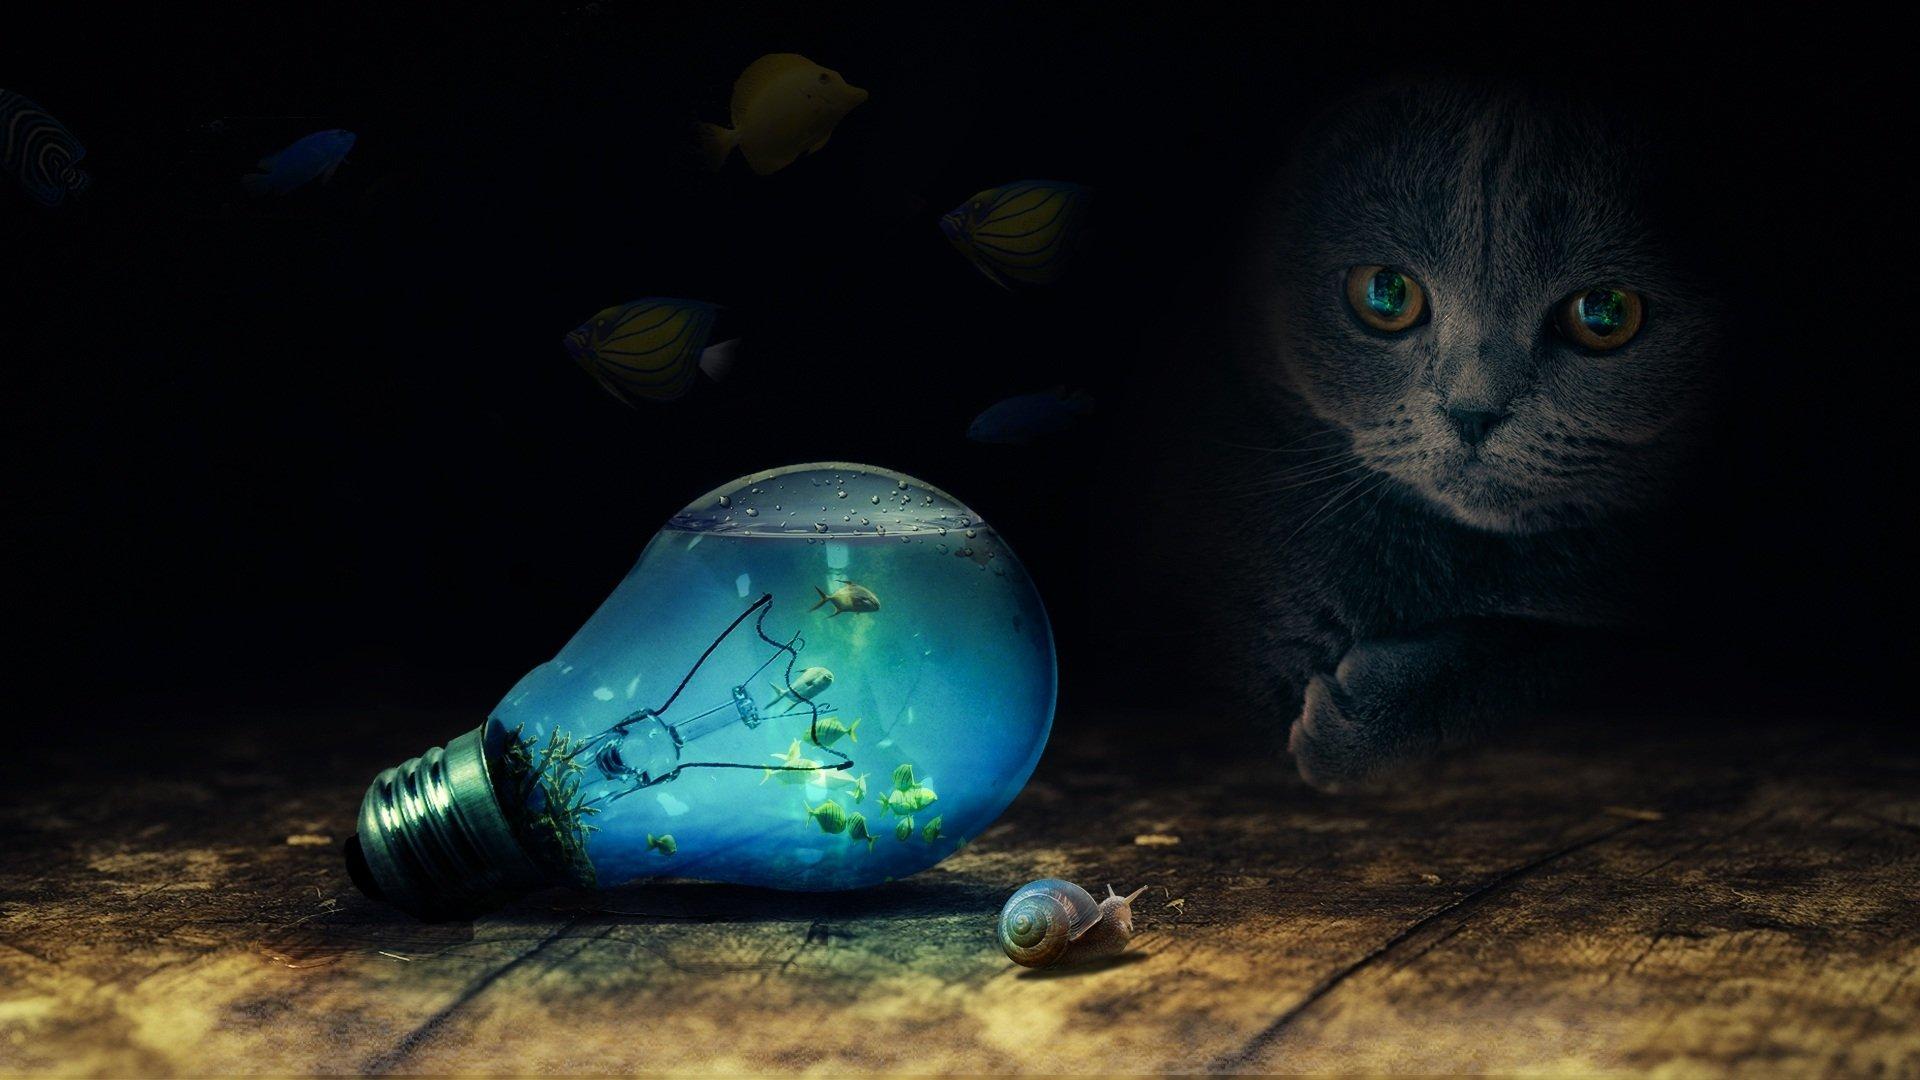 Photography - Manipulation  Cat Light Bulb Snail Fish Wallpaper